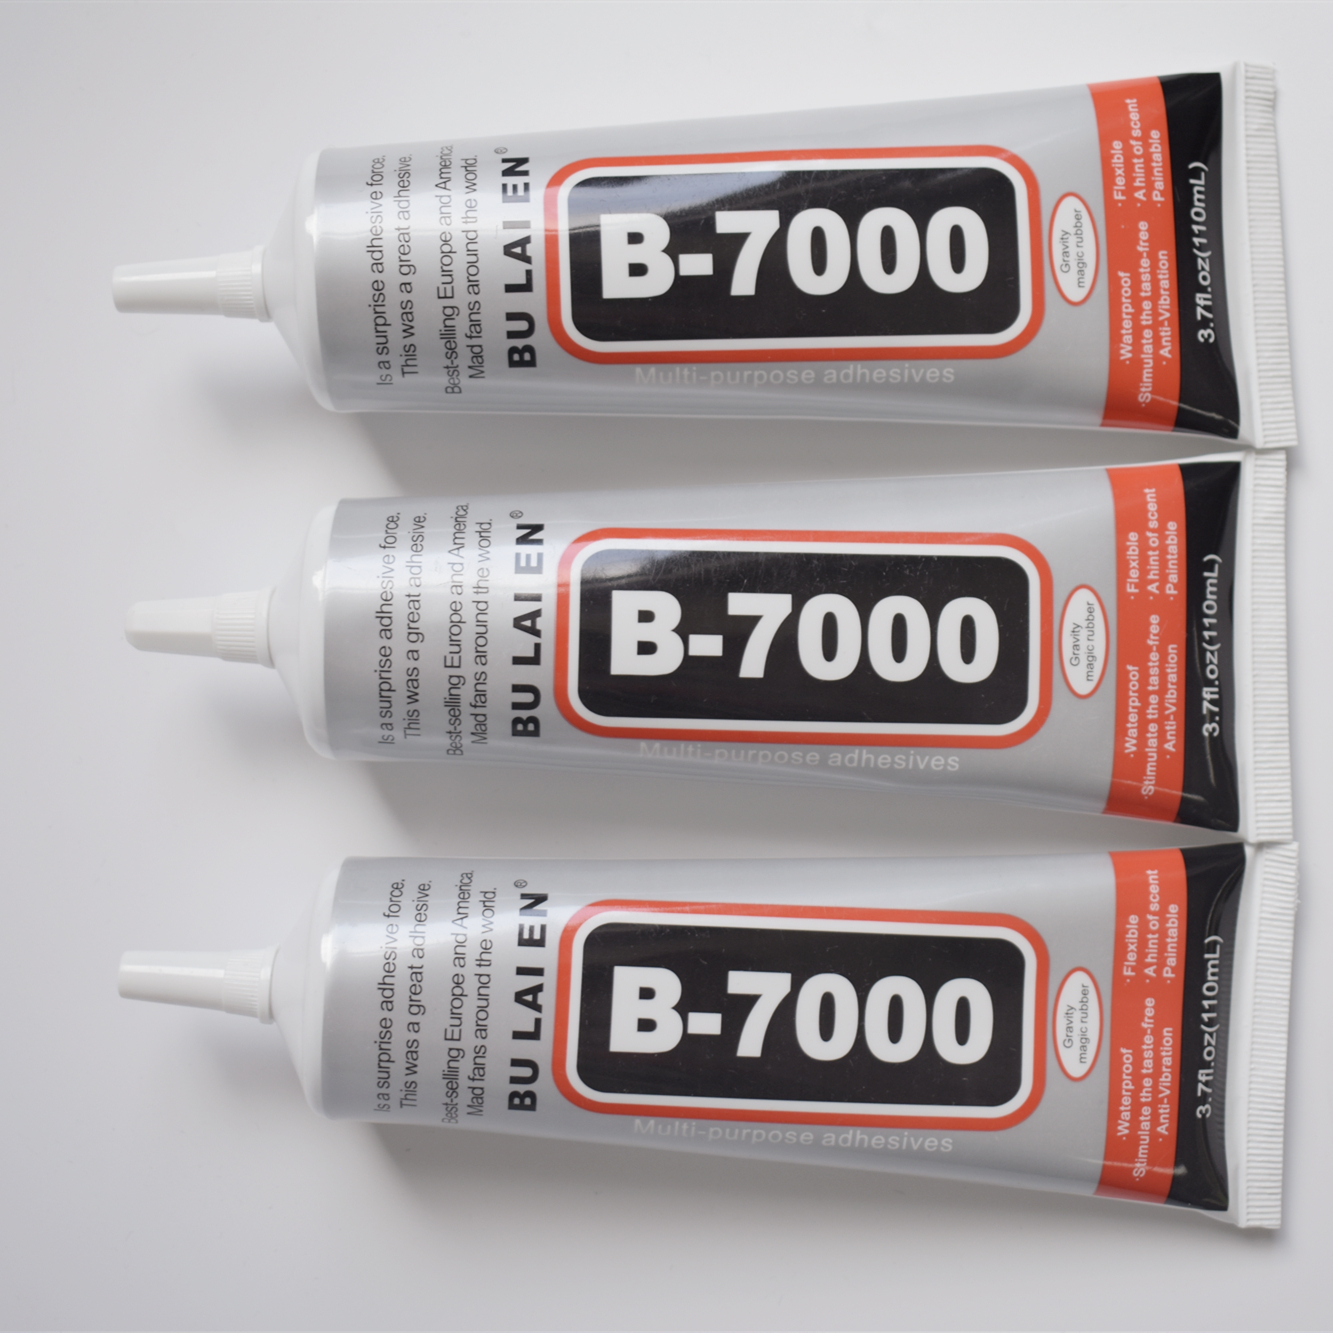 B7000 110ml B-7000 Glue B7000 Multi Purpose Glue Adhesive Epoxy Resin Repair Cell Phone LCD Touch Screen Super Glue B 7000 B7000